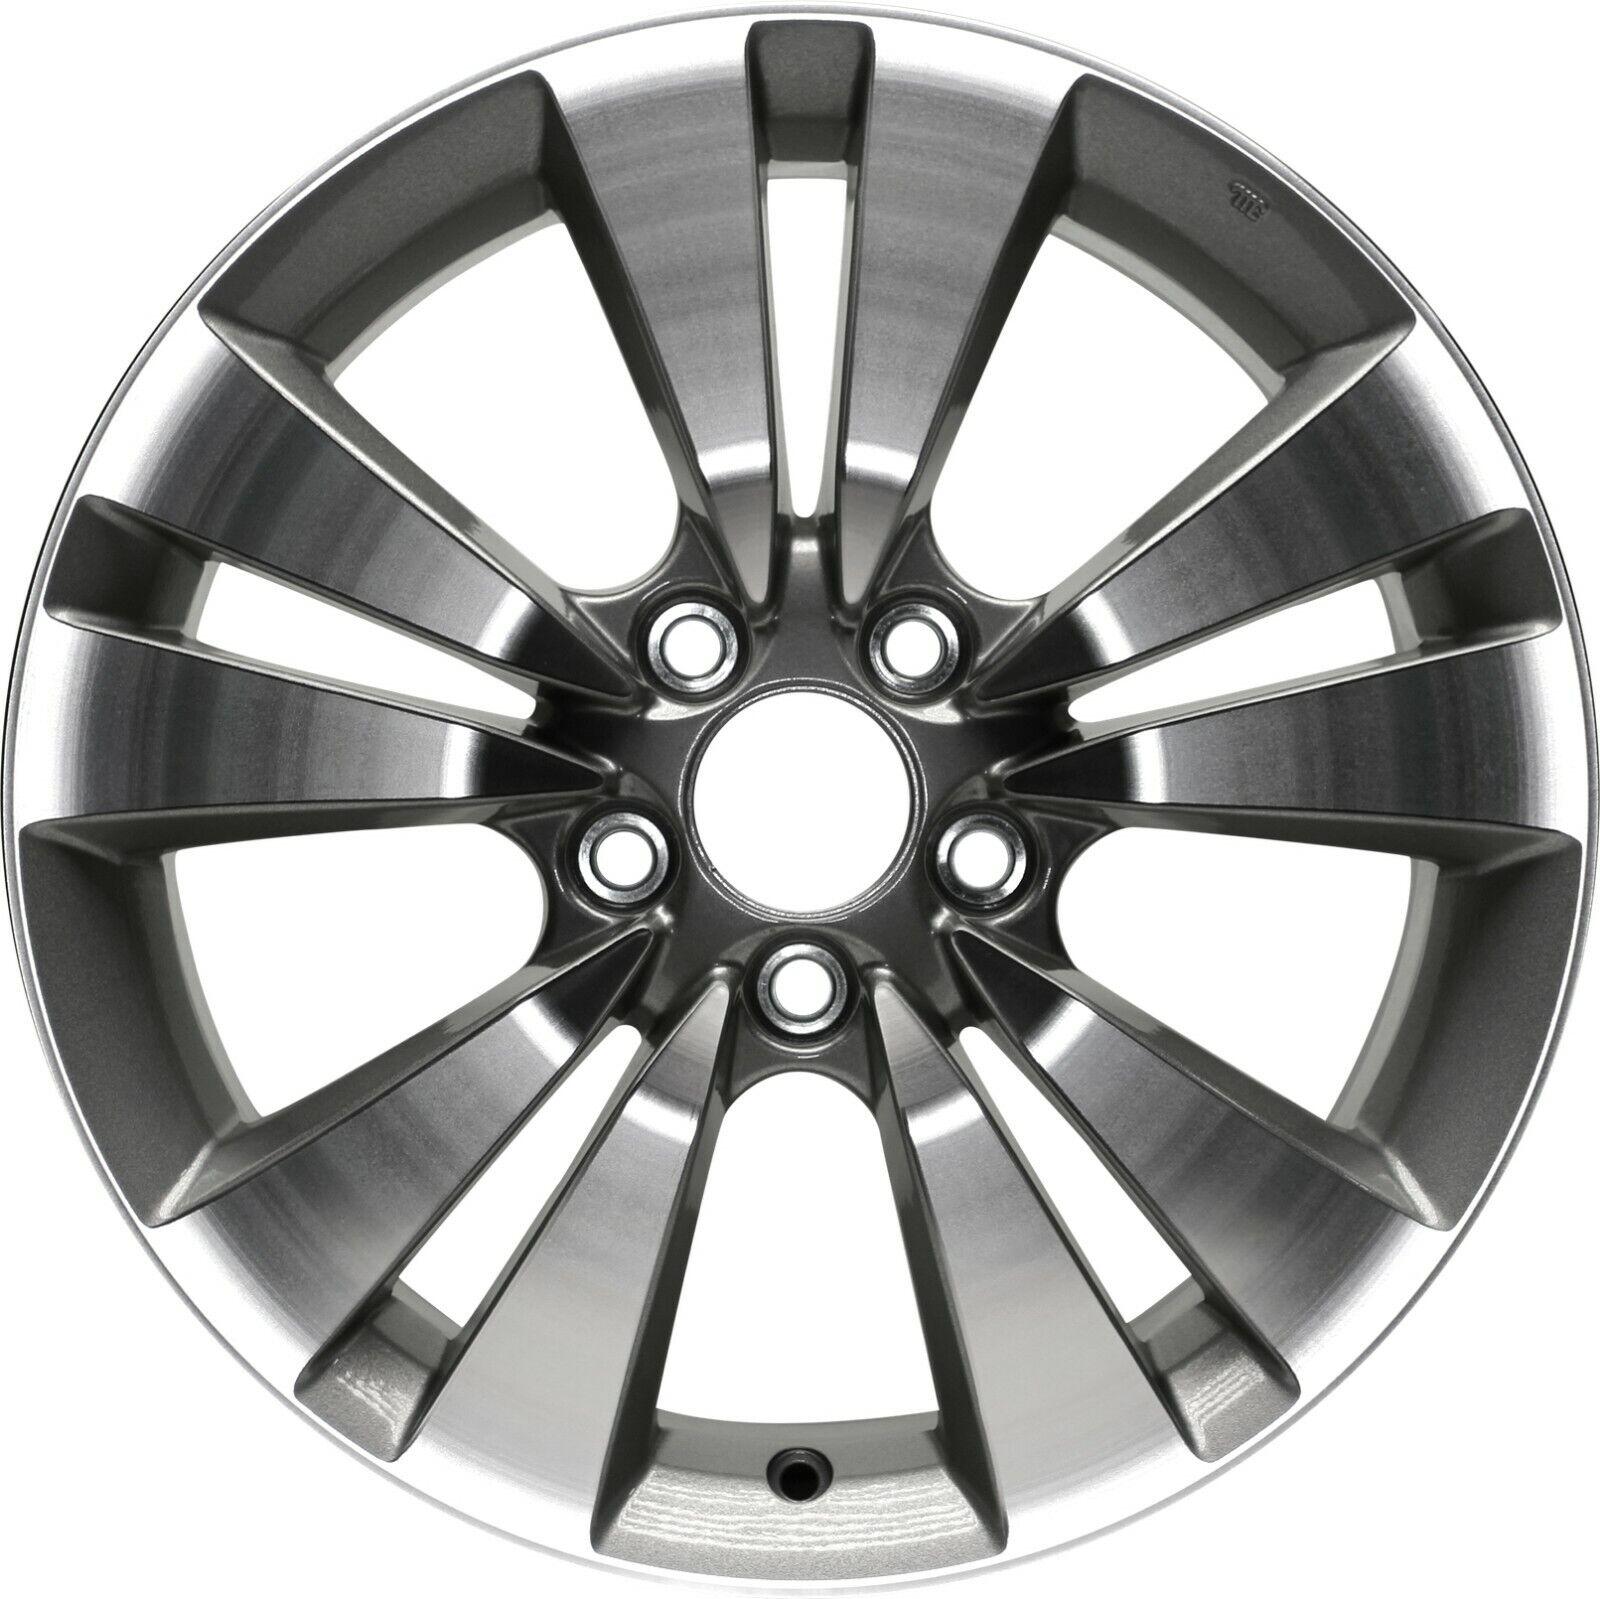 "Fits:New 17/""x6.5/"" 5Lug Hyundai Sonata 06-10 Aluminum Replica Wheel Rim 5x114.3"